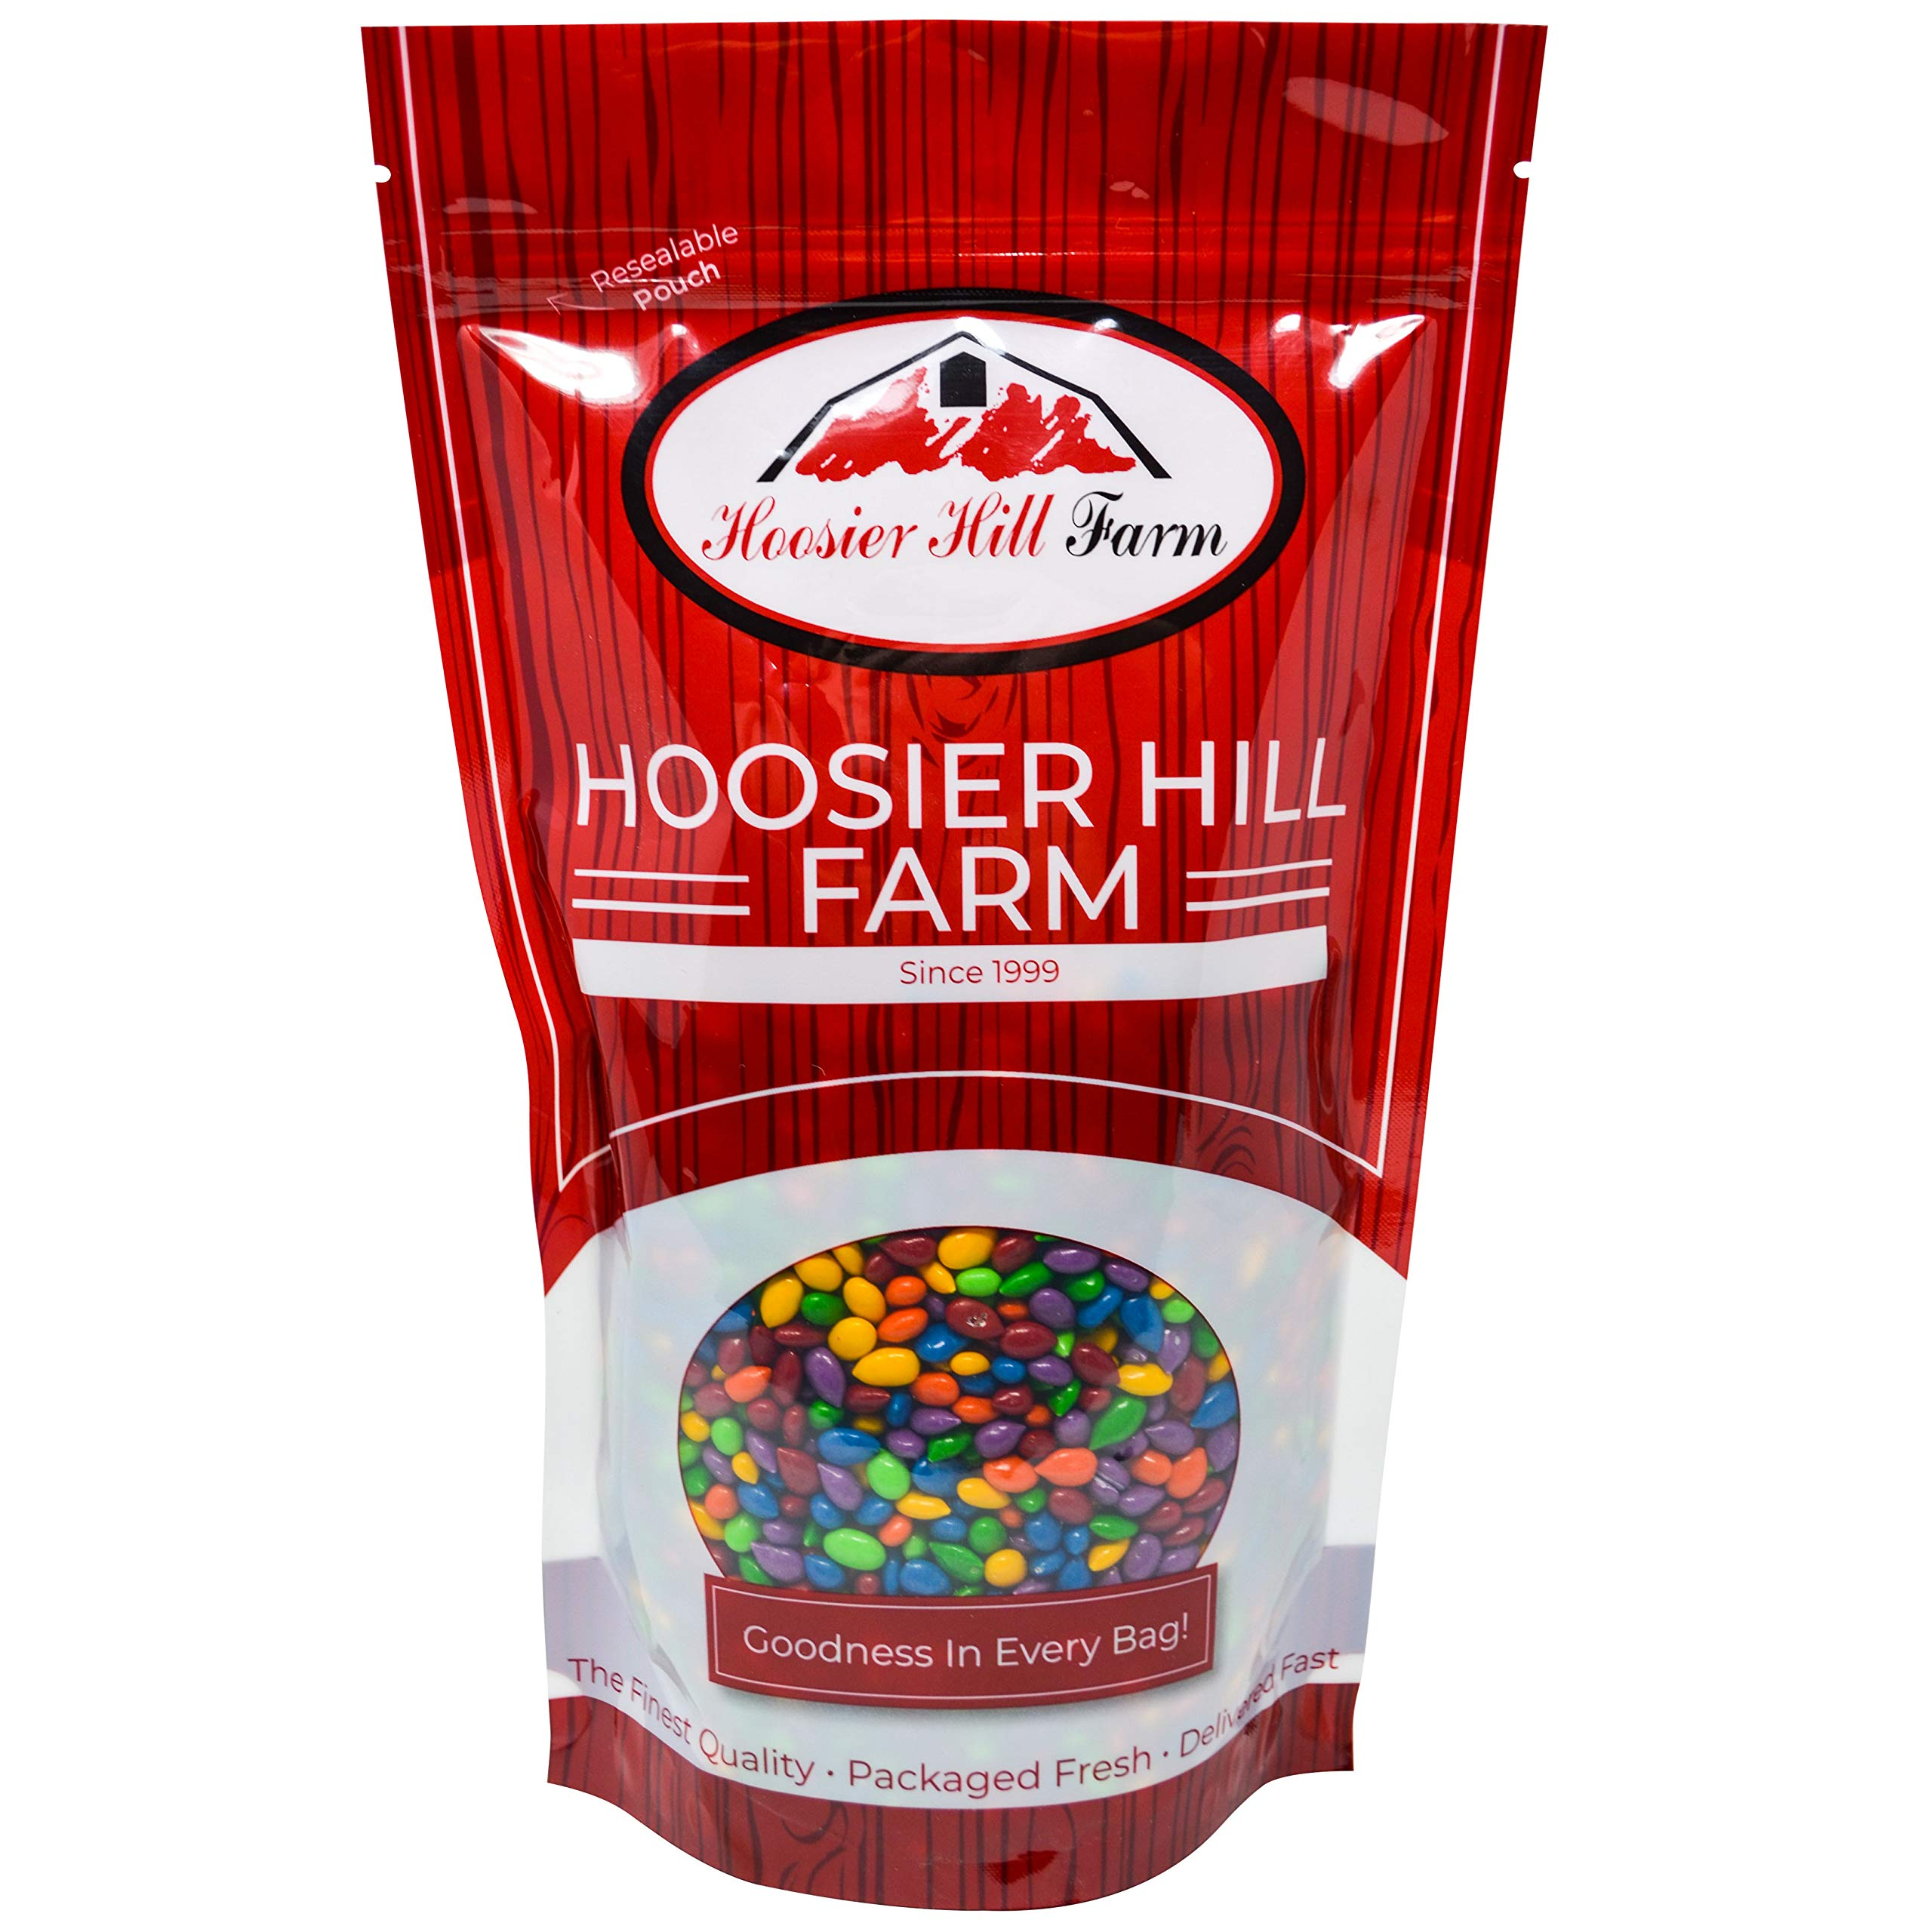 Hoosier Hill Farm Rainbow Seeds, chocolate covered & candy coated Sunflower seeds, (5 lb) by Hoosier Hill Farm